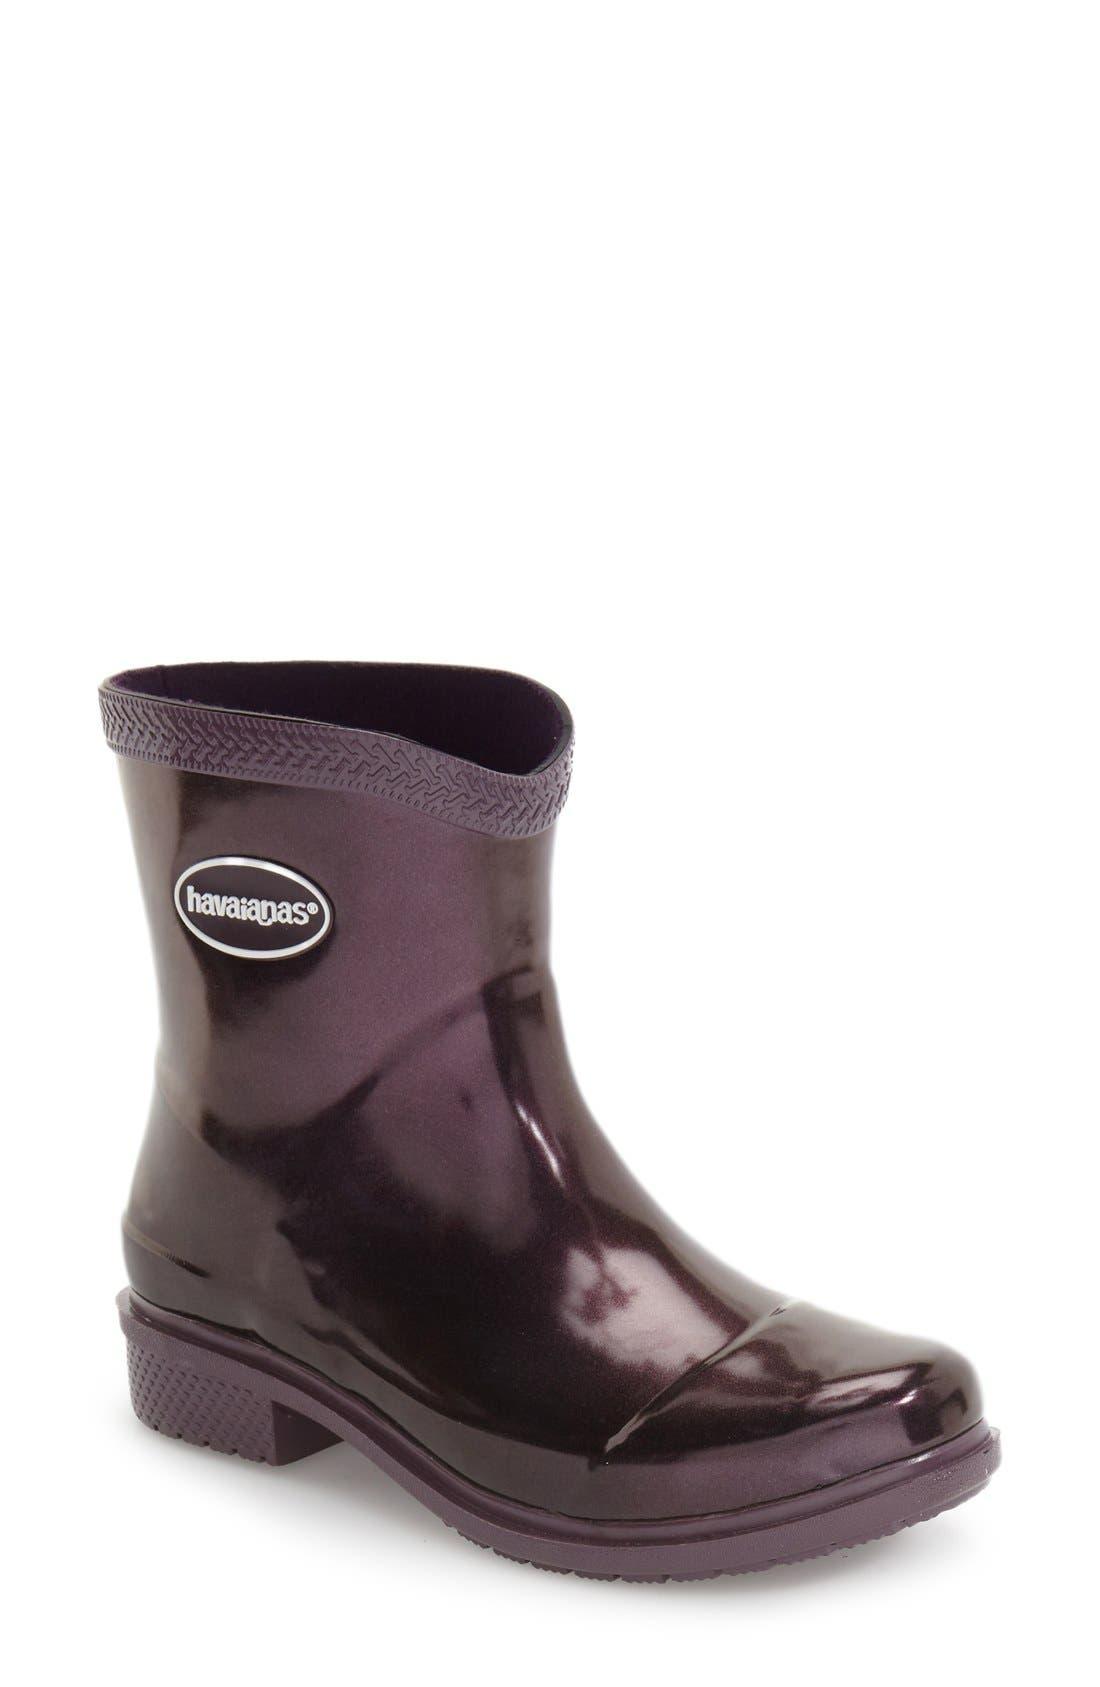 Alternate Image 1 Selected - Havaianas 'Galochas Low Metallic' Waterproof Rain Boot (Women)